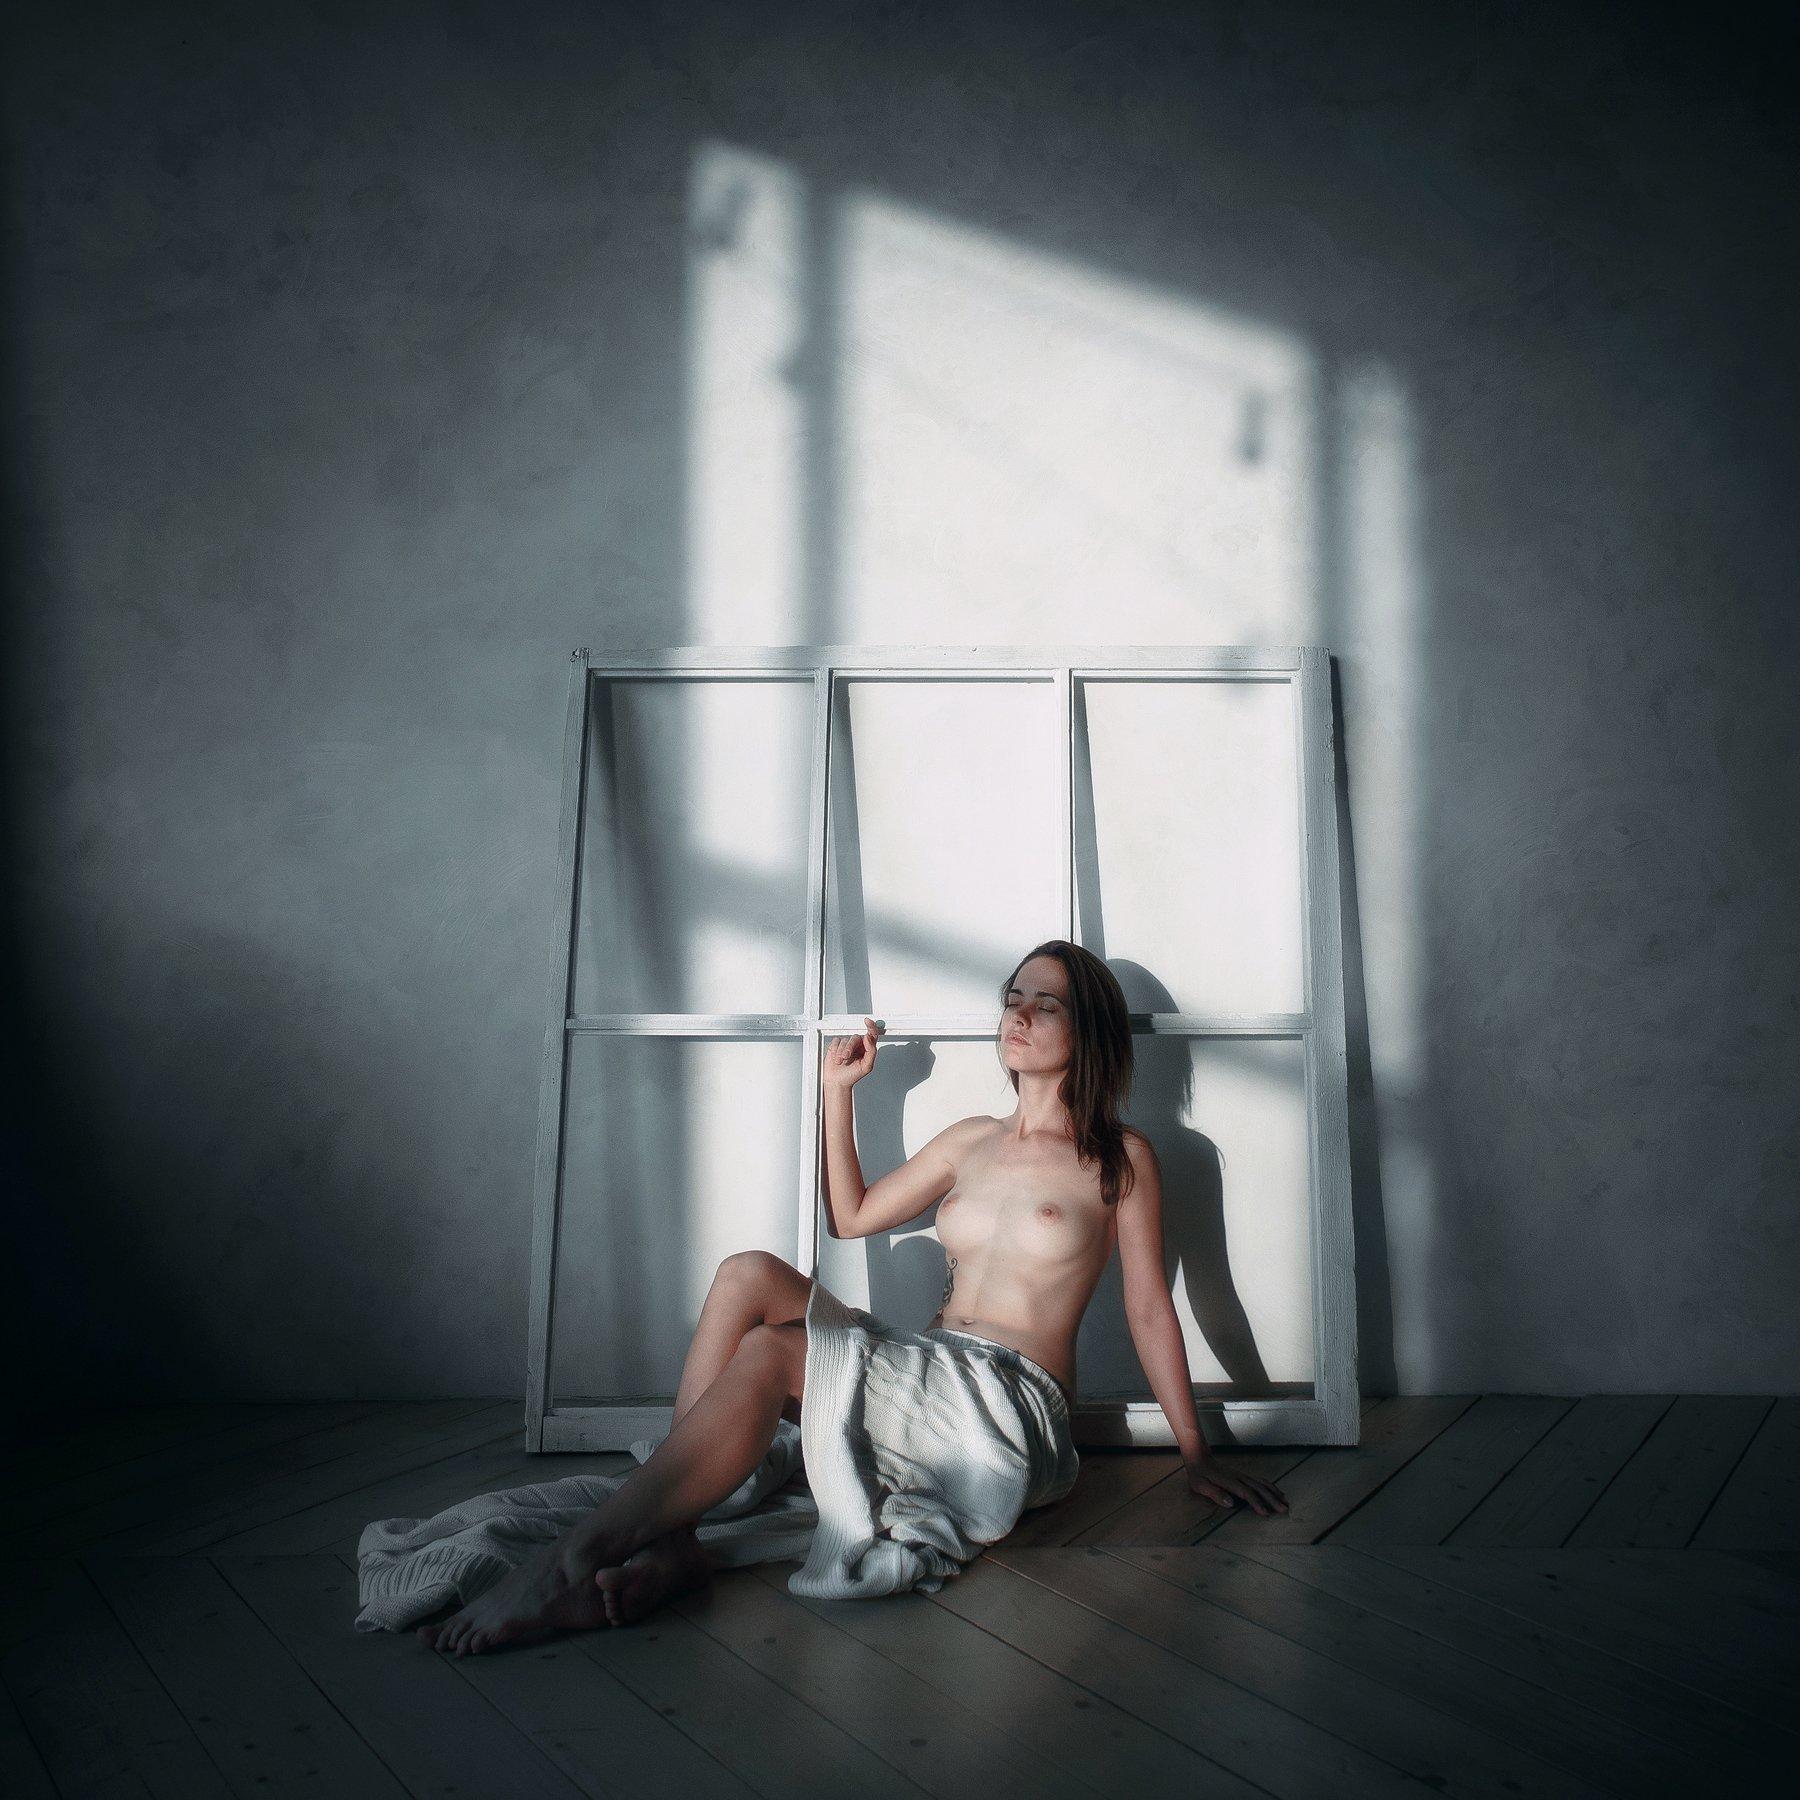 girl, model, nude, dream, silence, window, night, light, room, darkness, peace, russia, Васильев Андрей